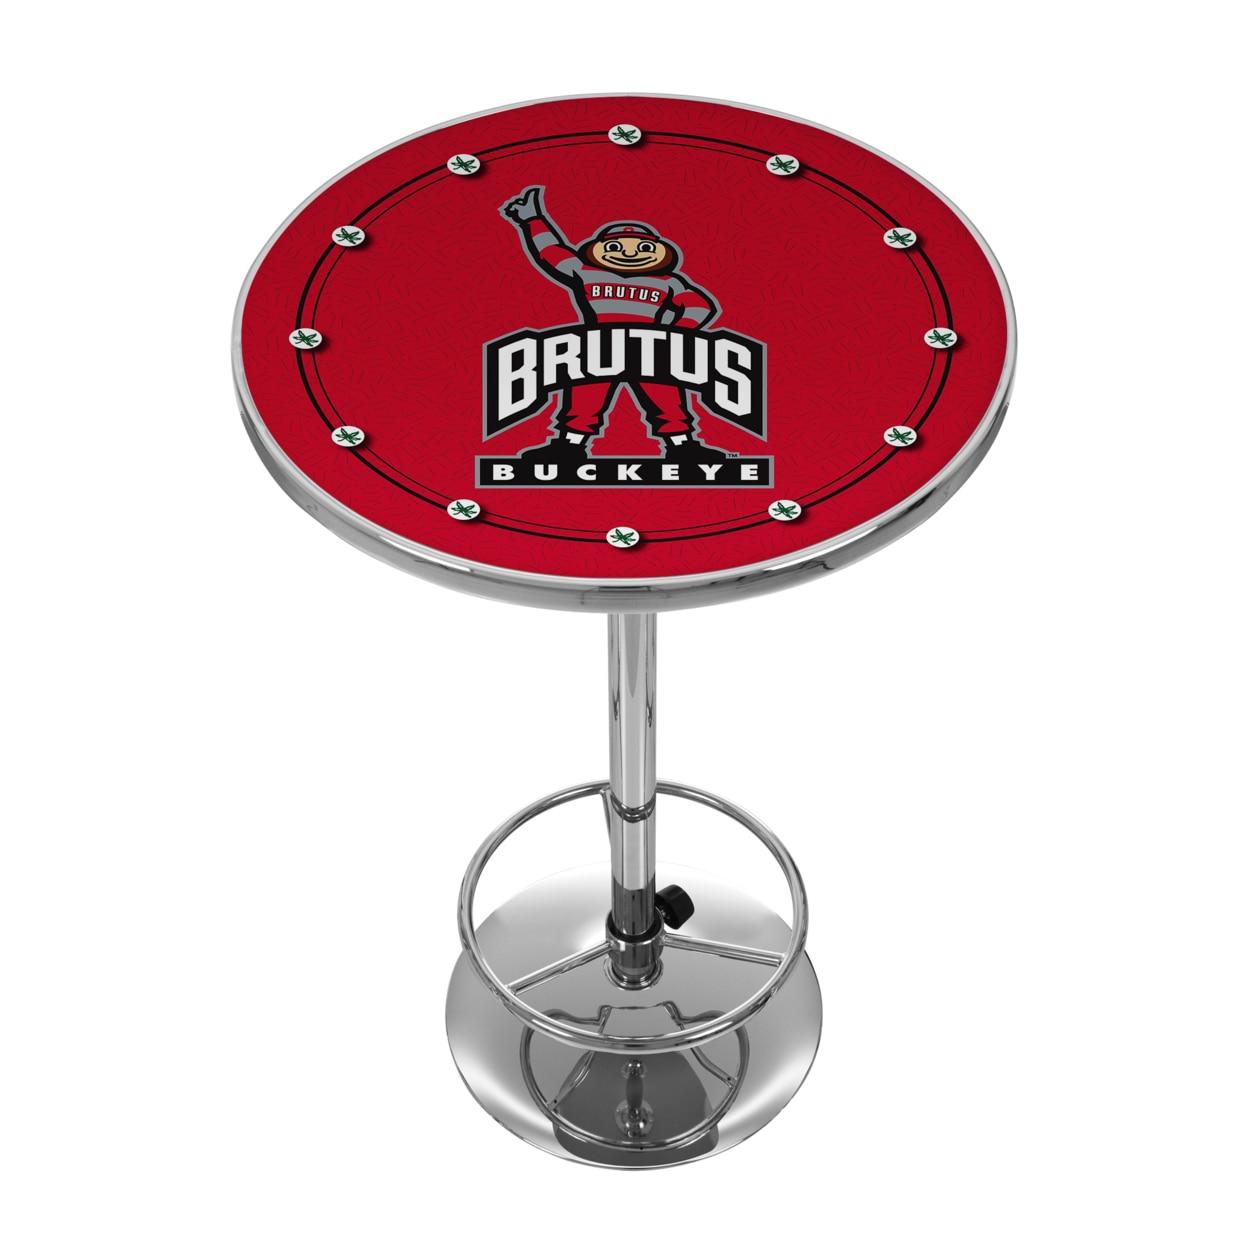 The Ohio State University 42 Inch Pub Table - Brutus ботинки meindl meindl ohio 2 gtx® женские